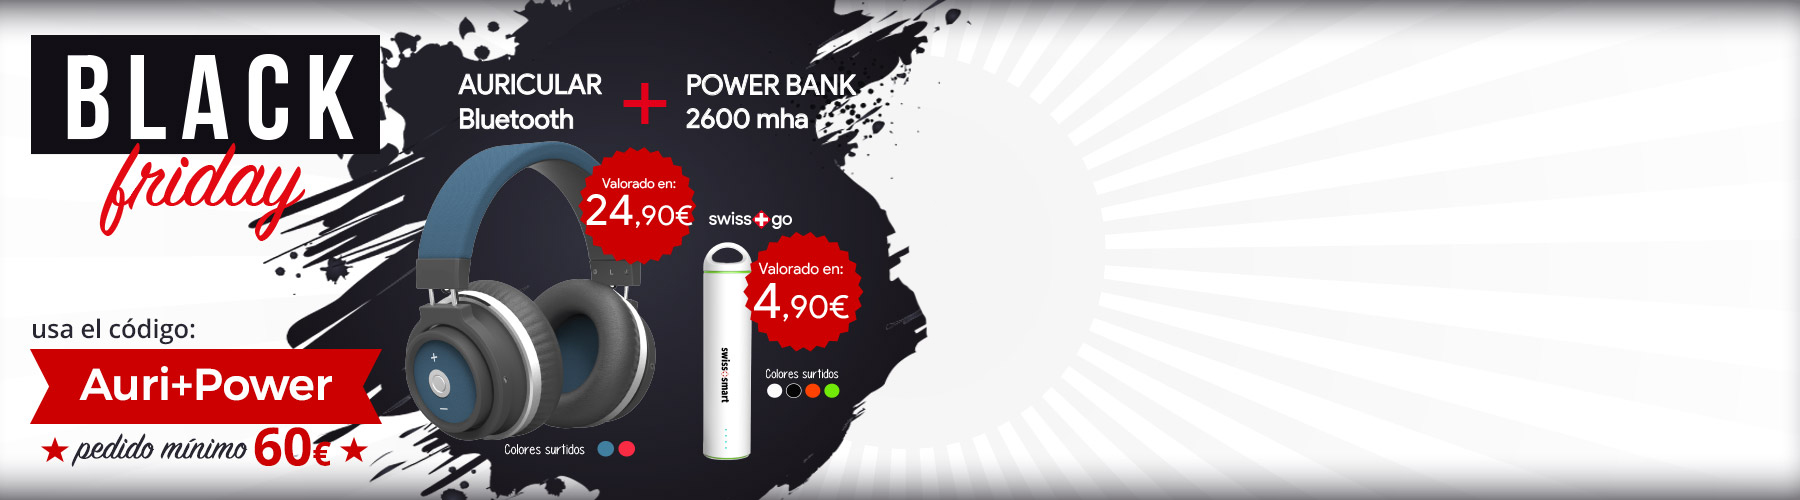 regalo auriculares Bluetooth Power Bank